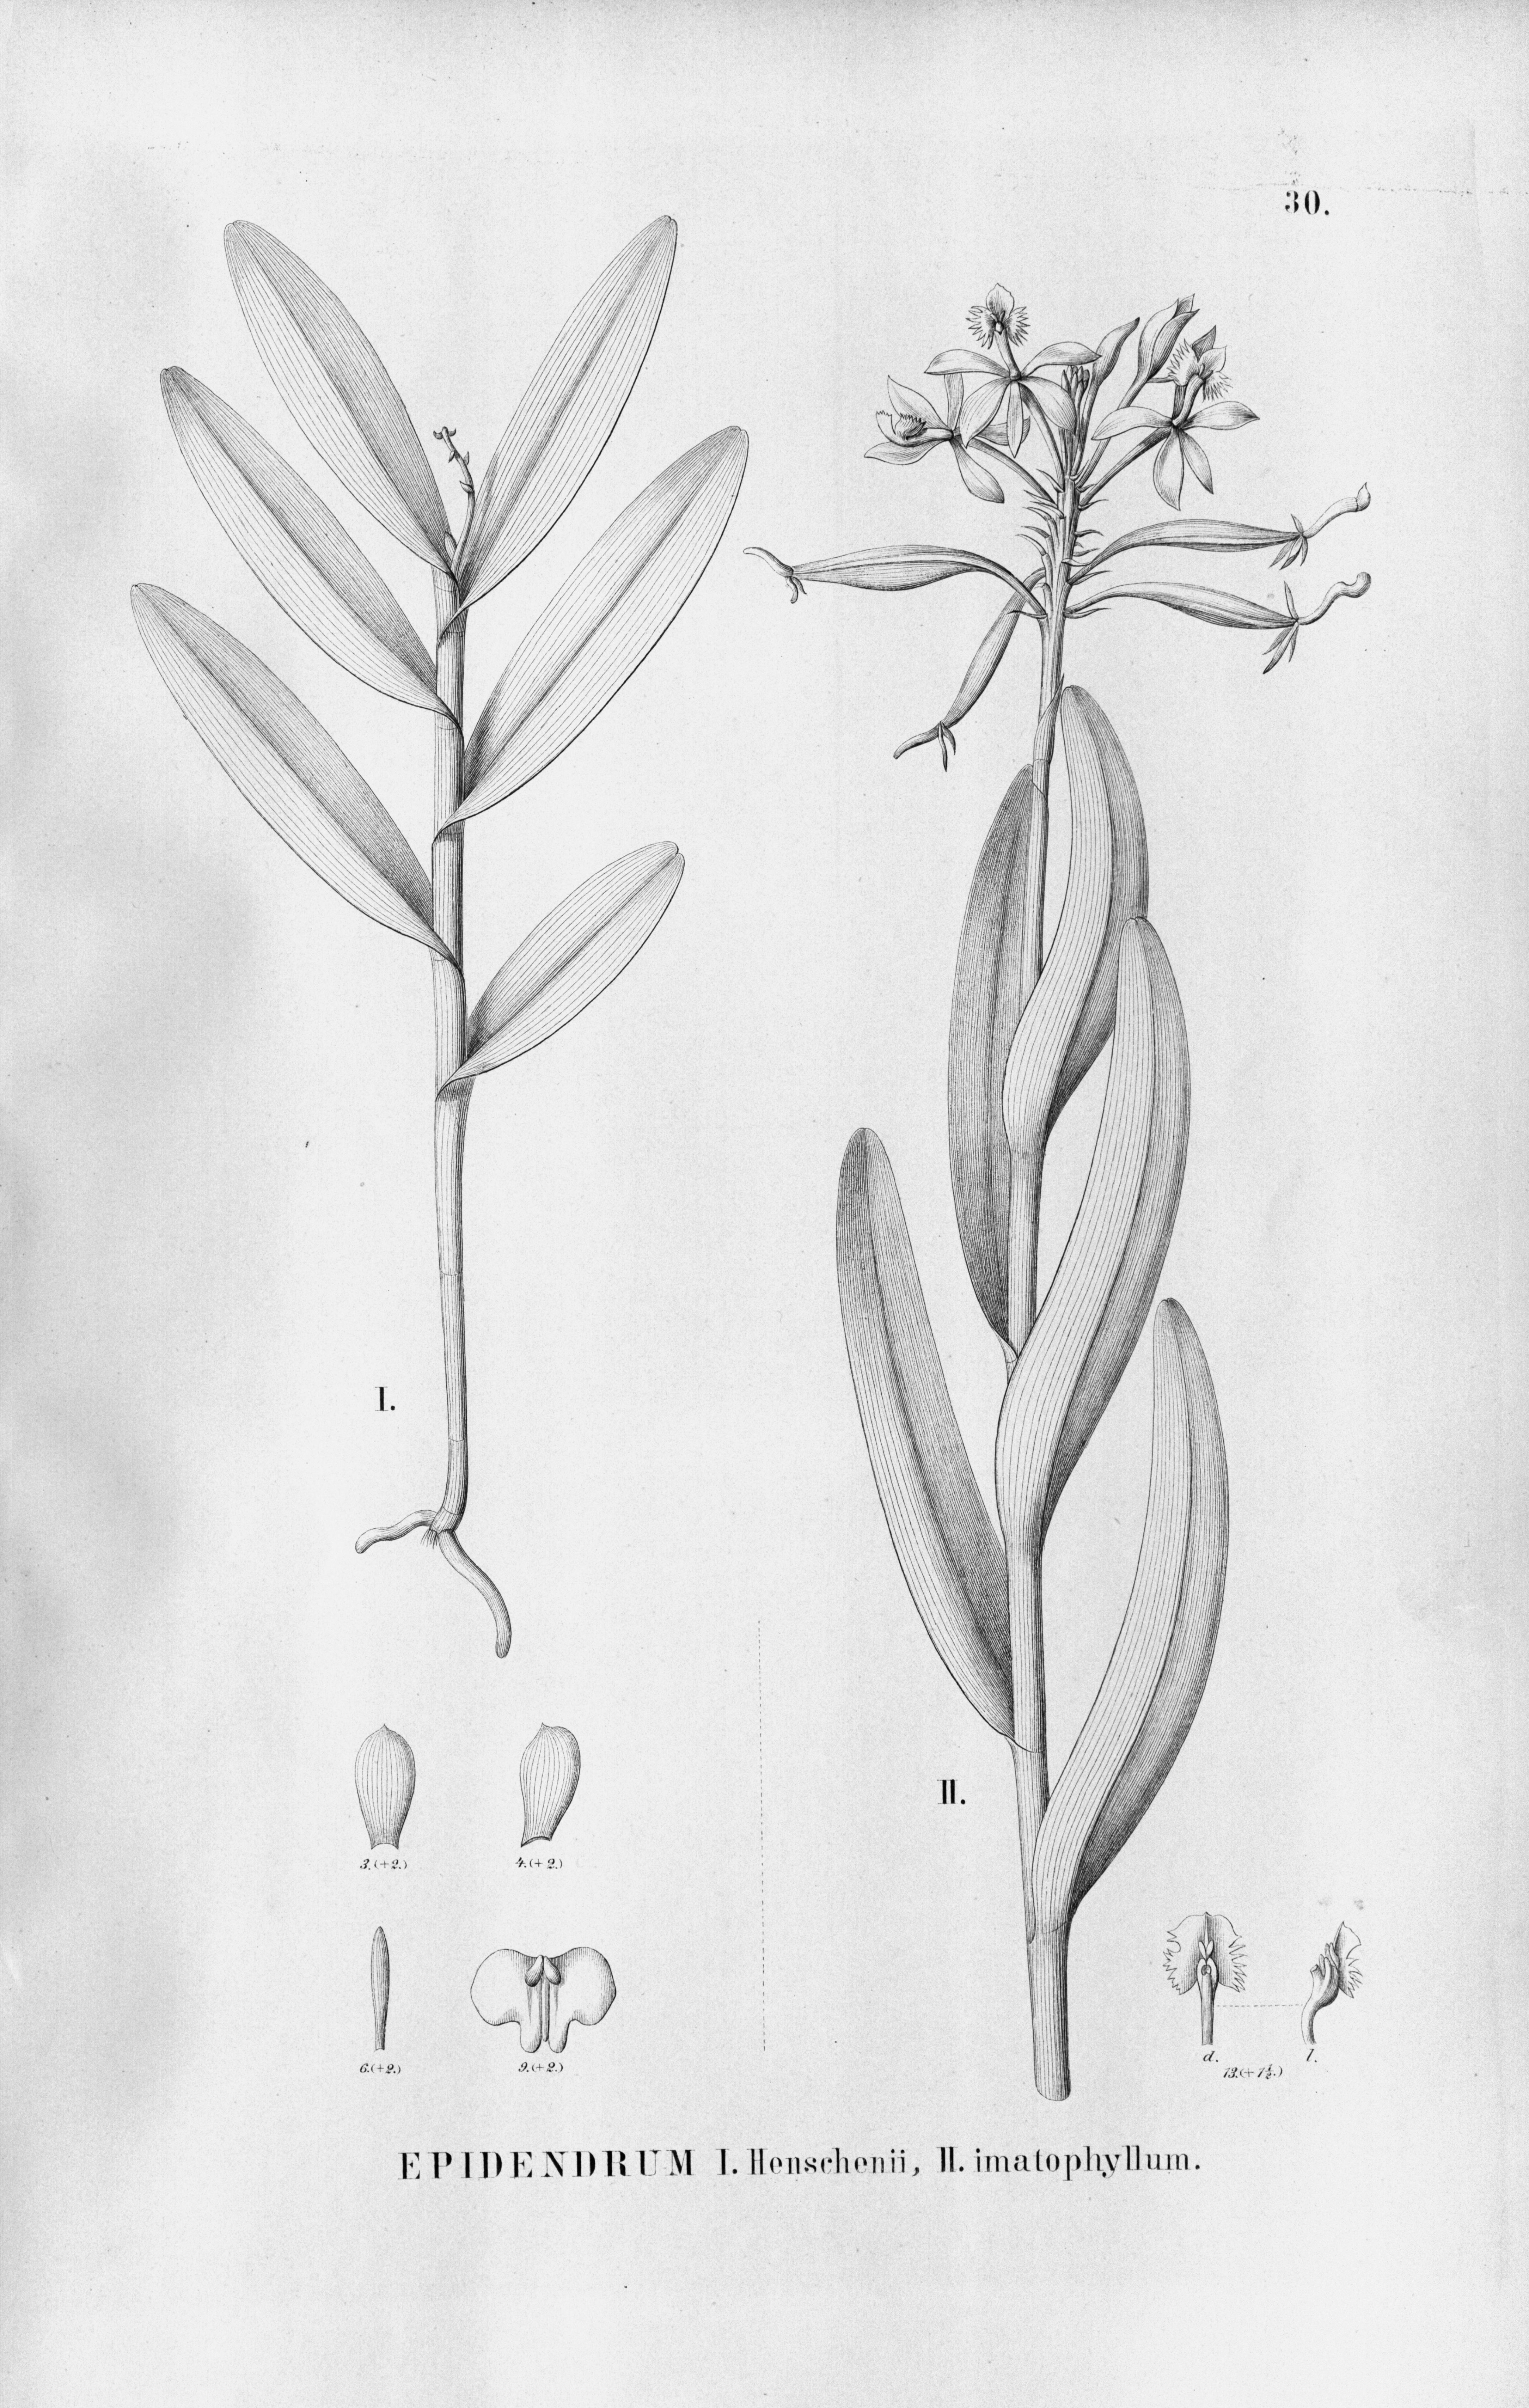 Tập tin:Epidendrum henschenii and Epidendrum imatophyllum - Fl.Br.3-5